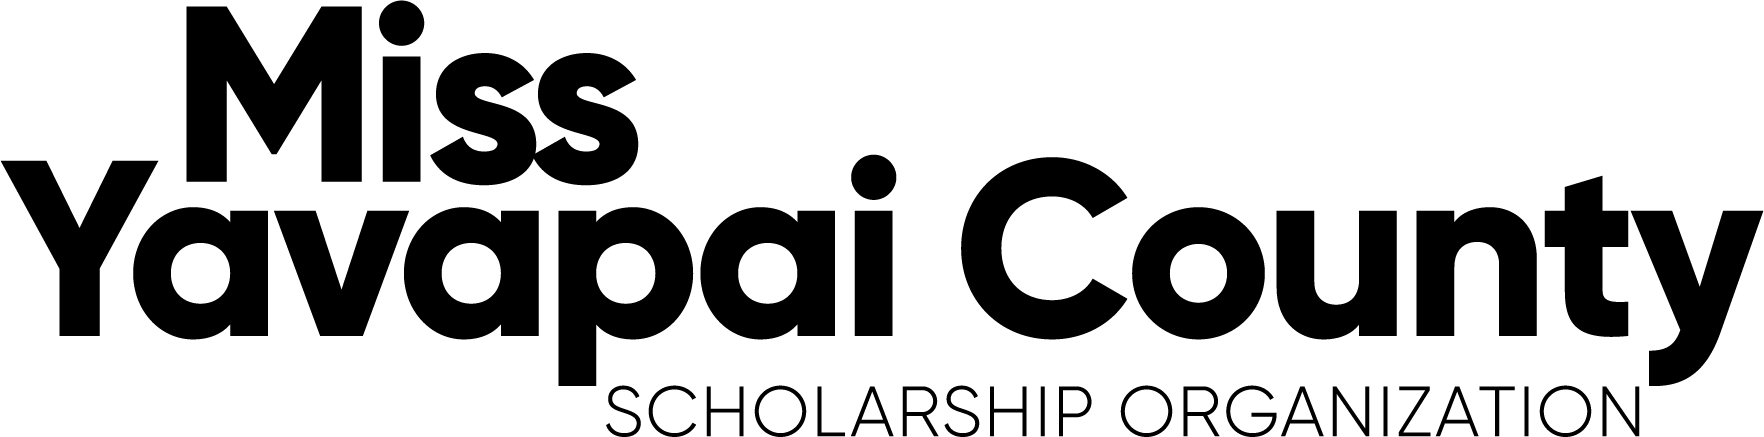 Miss Yavapai County Scholarship Organization